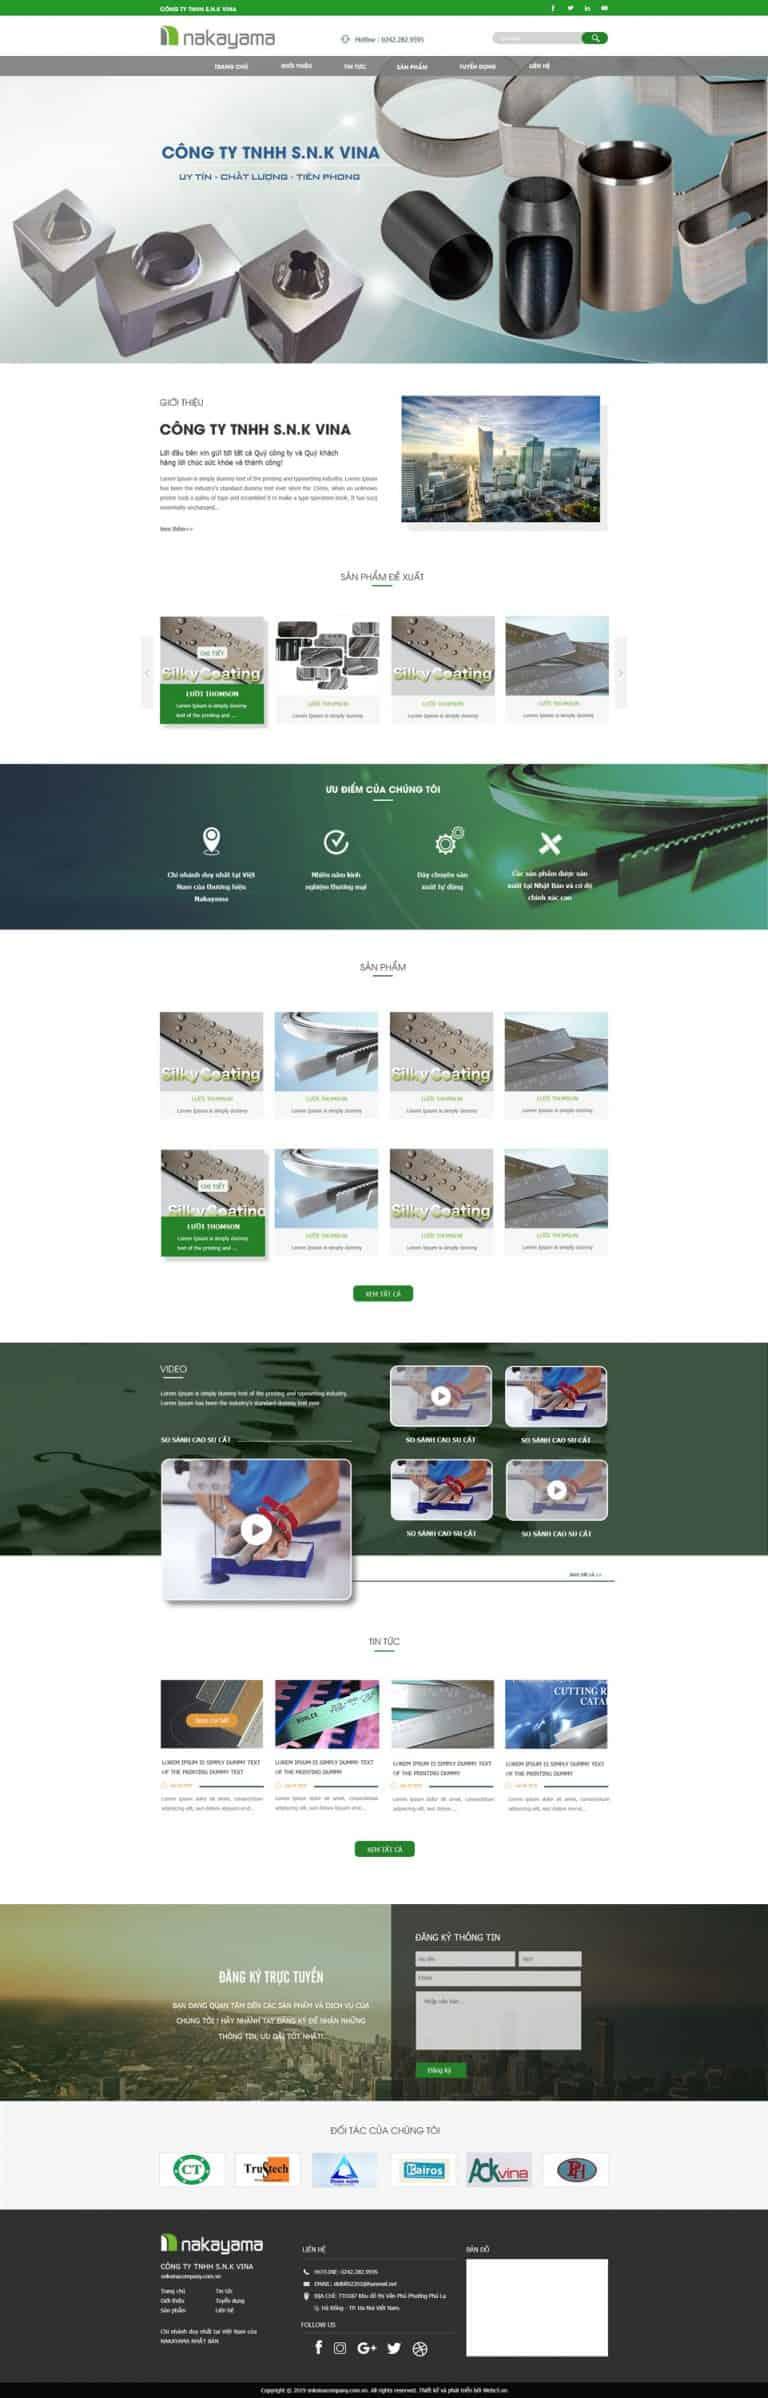 Thiết kế website Sản xuất dao Nakayama